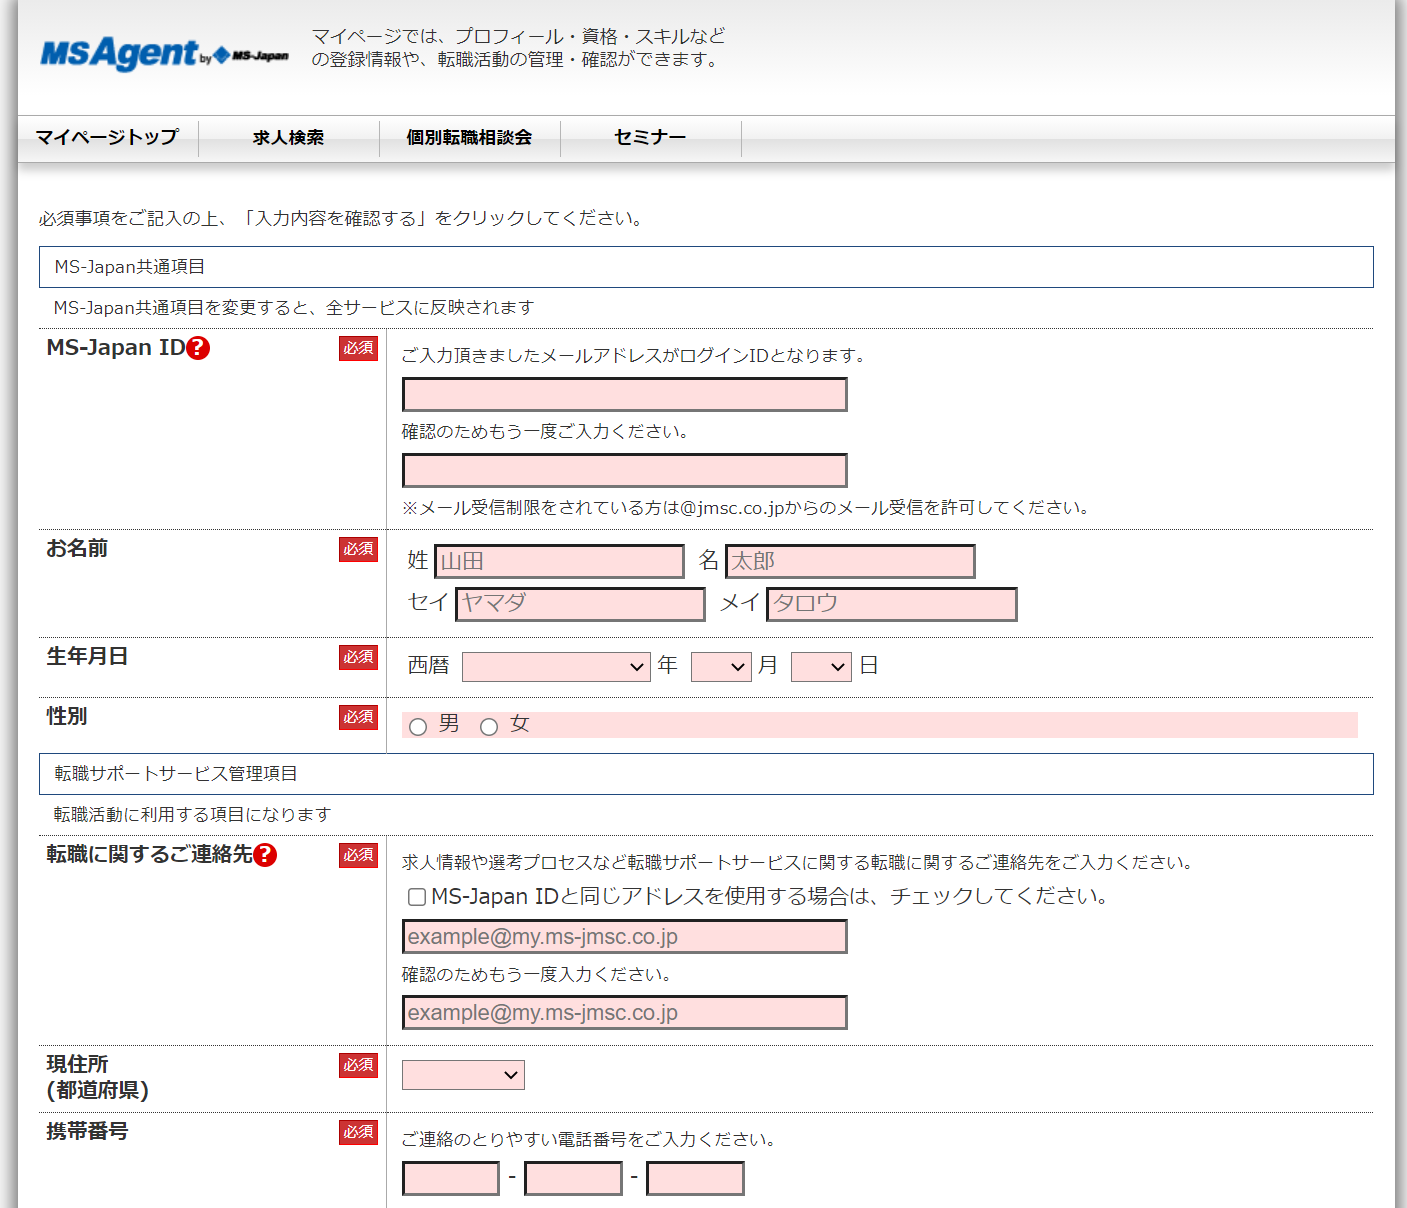 MS-Japan登録画面